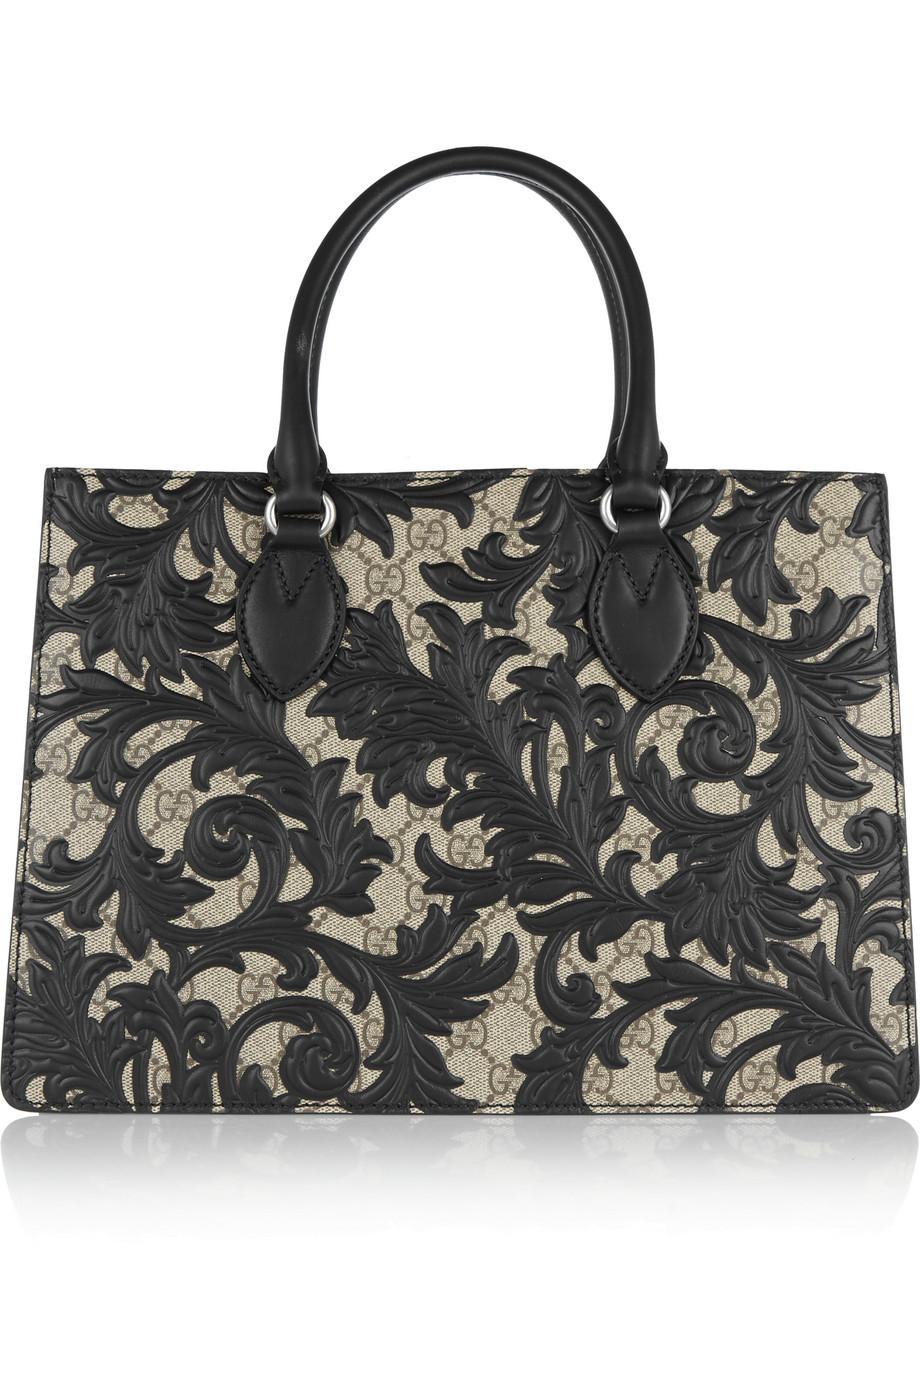 Gucci Linea A Medium Leather-Appliquéd Coated Canvas Tote, Black, Women's